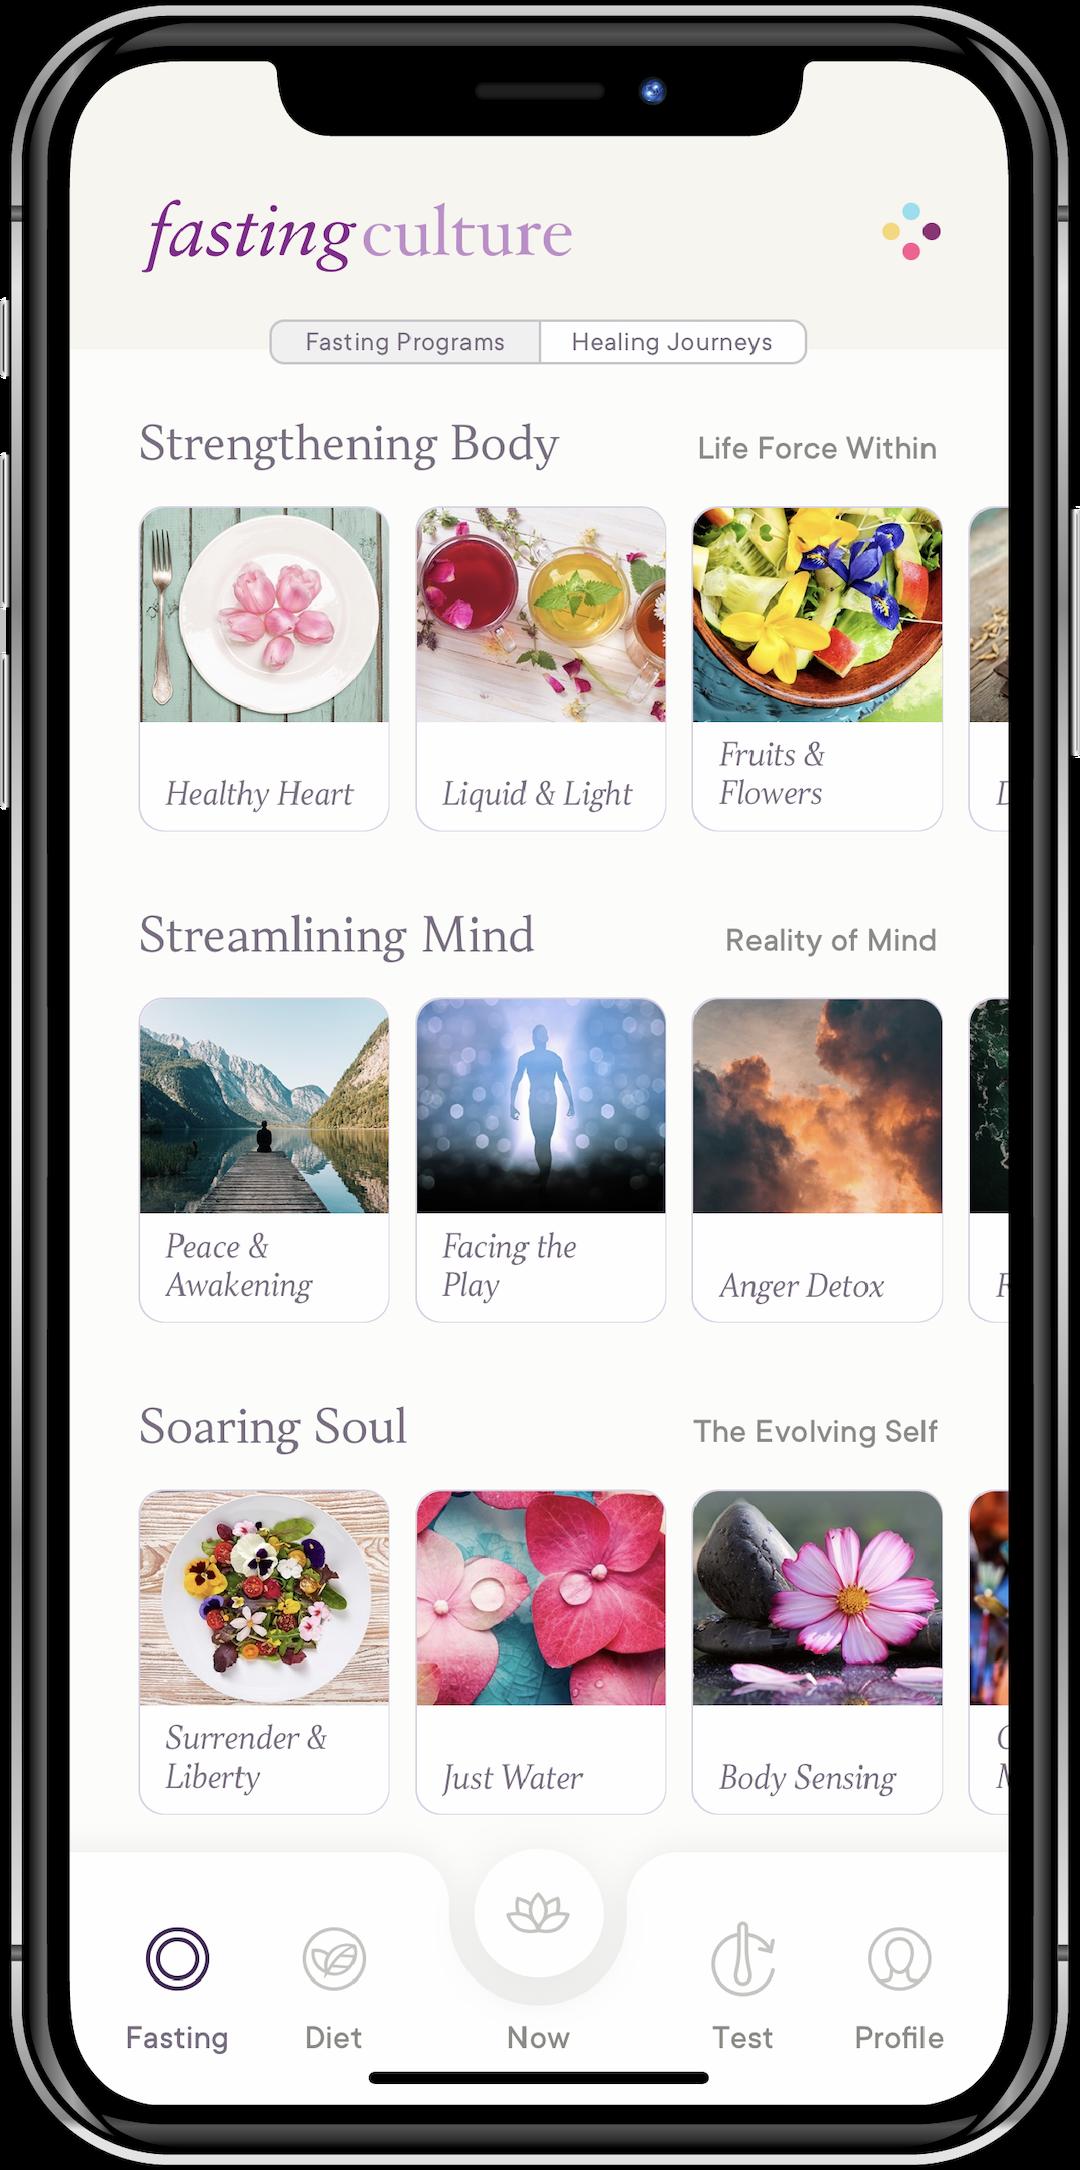 Fasting Culture App - Programs